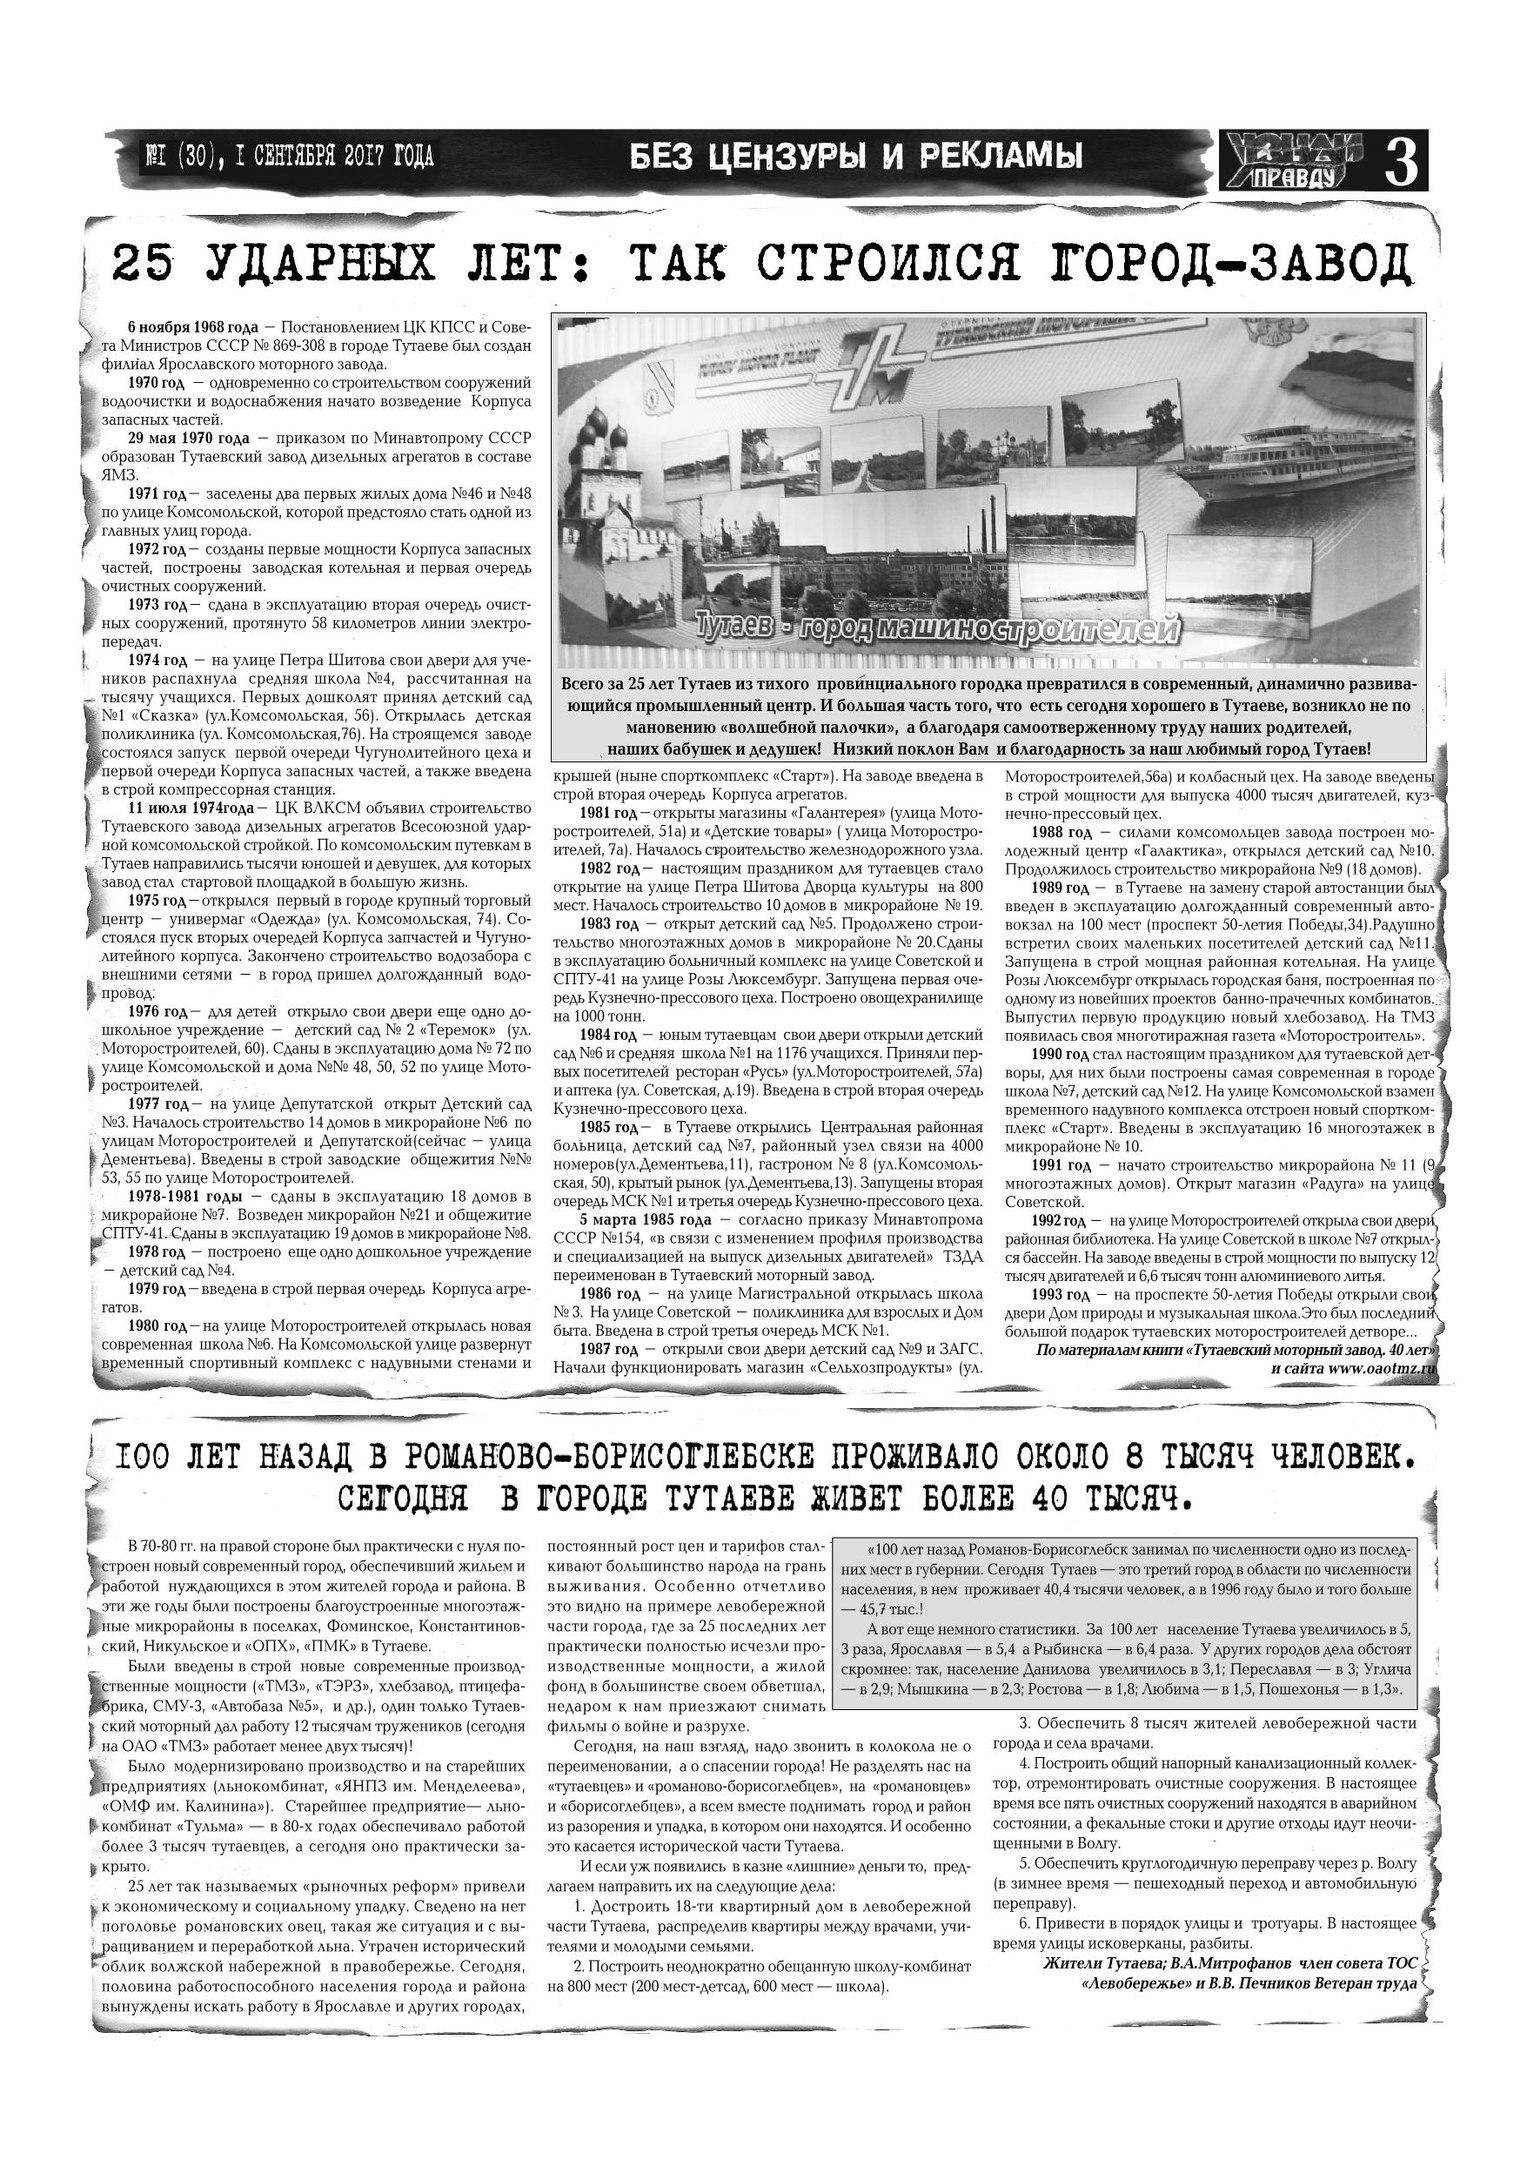 Газета УЗНАЙ ПРАВДУ №30, стр.3